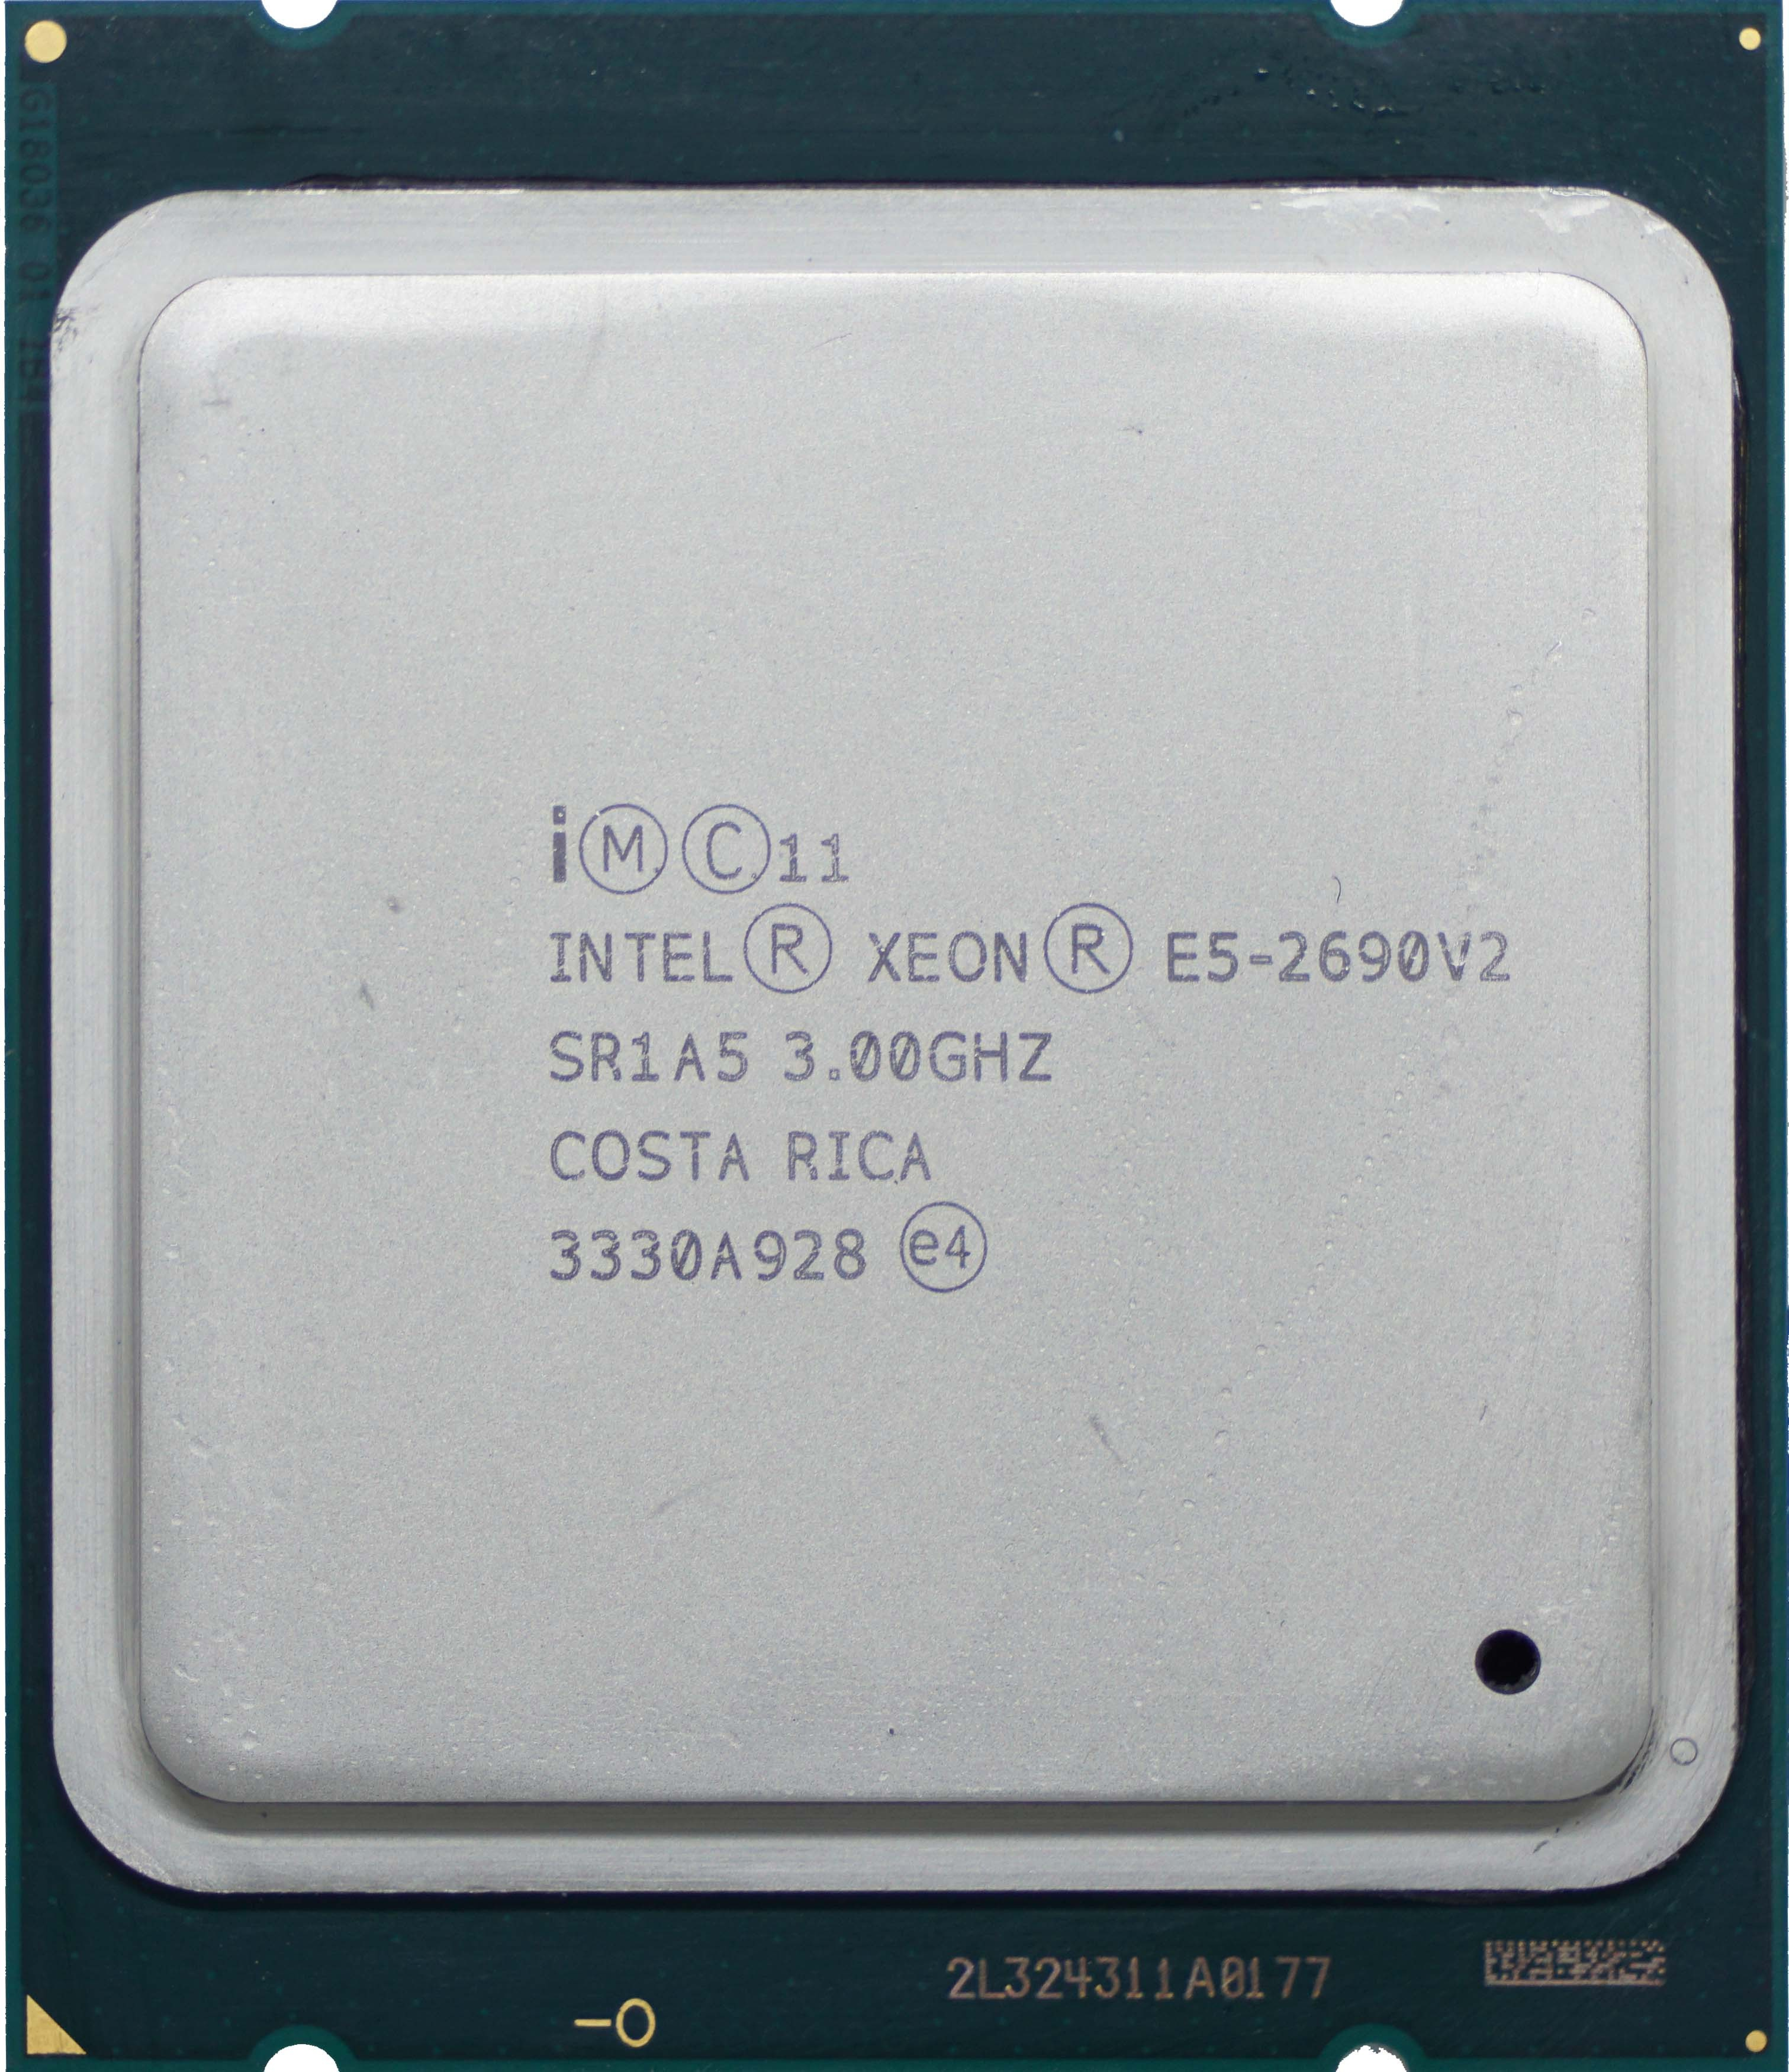 Intel Xeon E5-2690 V2 (SR1A5) 3 00Ghz Ten (10) Core LGA2011 130W CPU